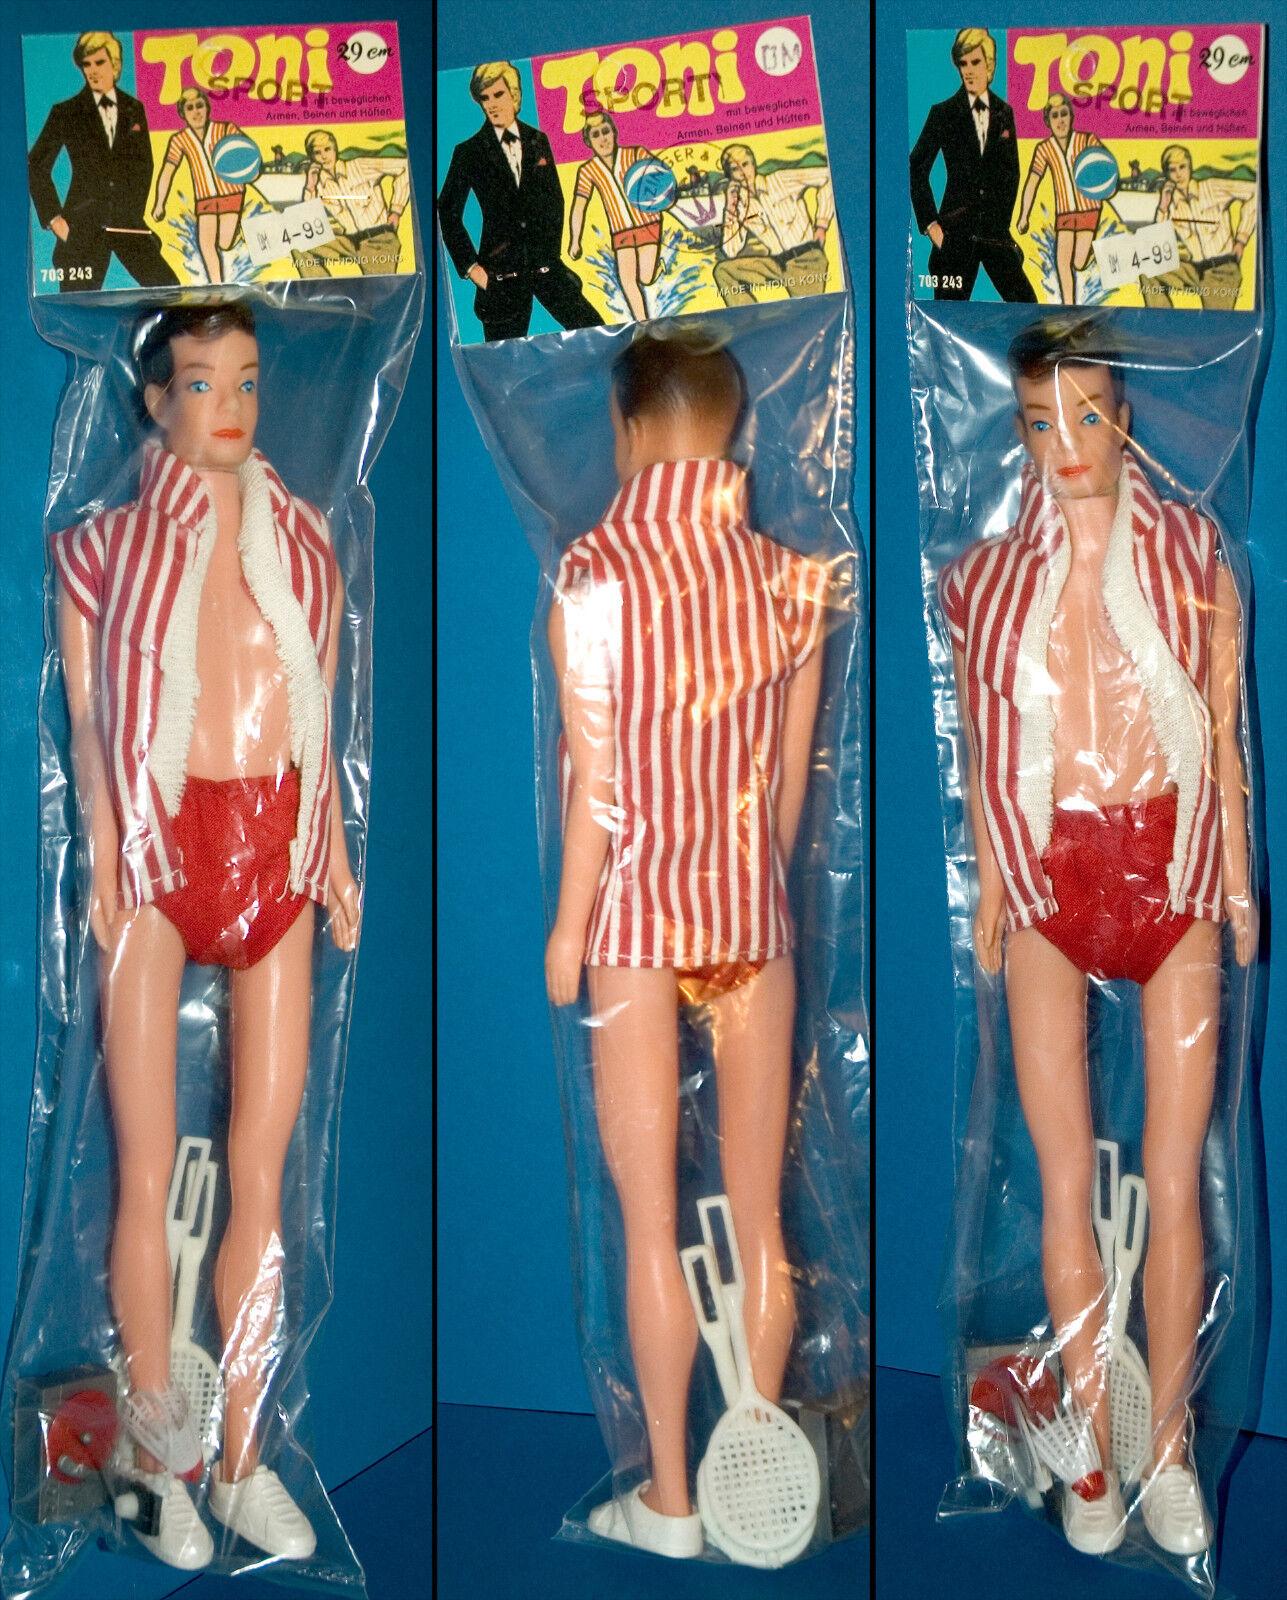 TONI SPORT 29cm PLASTIK PUPPE HONG KONG OVP 70er VINTAGE androgyn DOLL RARITÄT